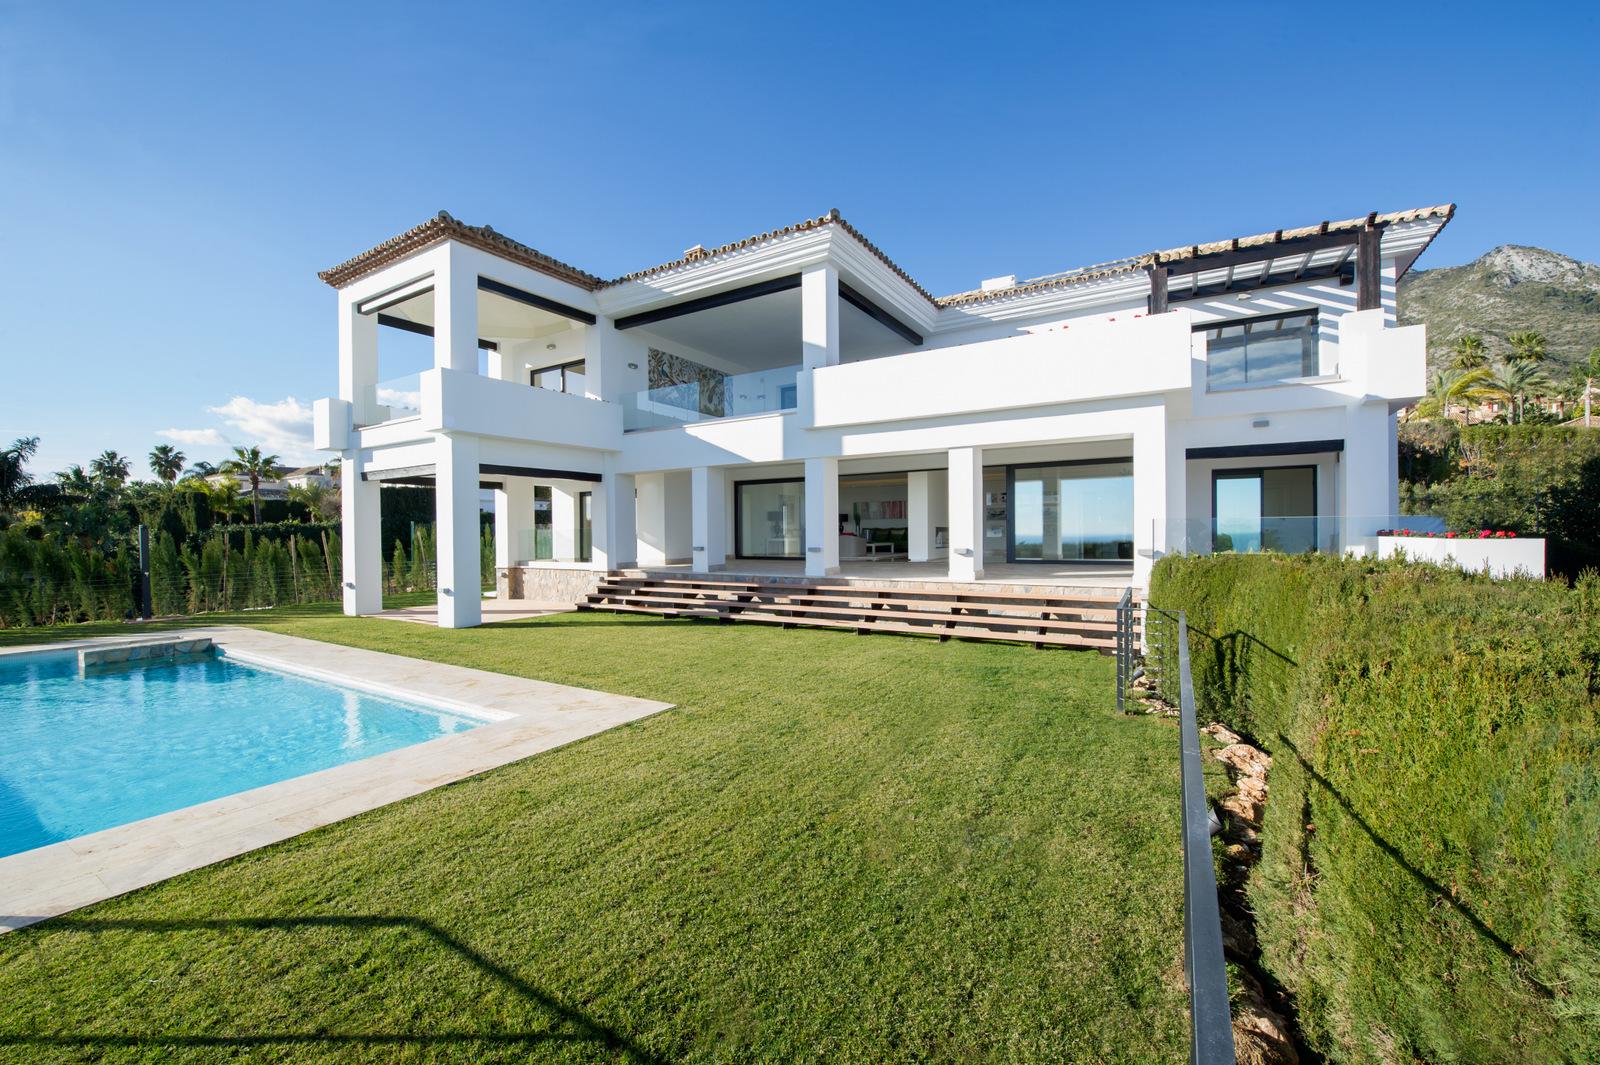 Modern Villa with Breathtaking Views in Sierra Blanca